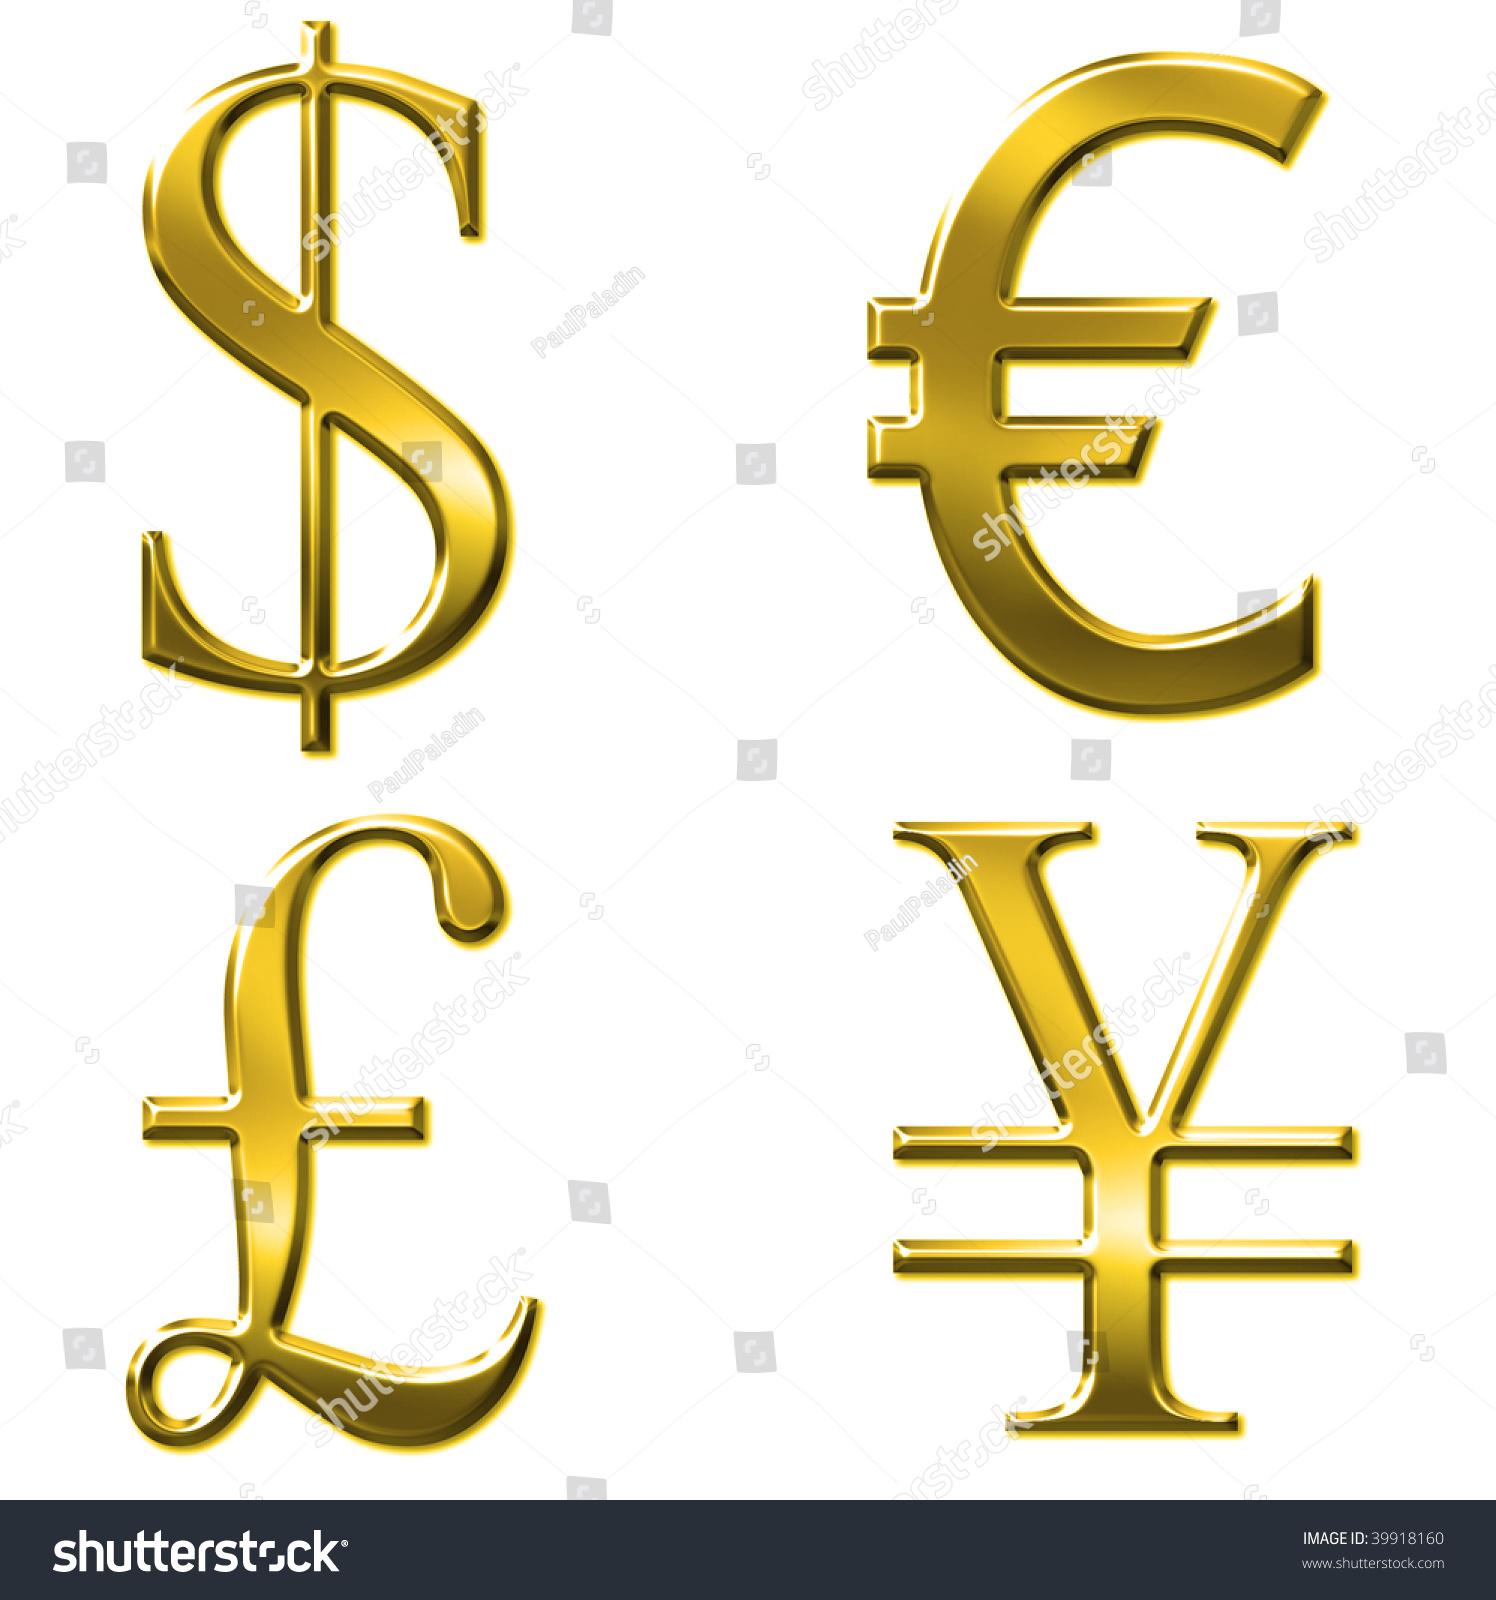 Currency Euro Dollar Yen Pound Symbols Stock Illustration 39918160